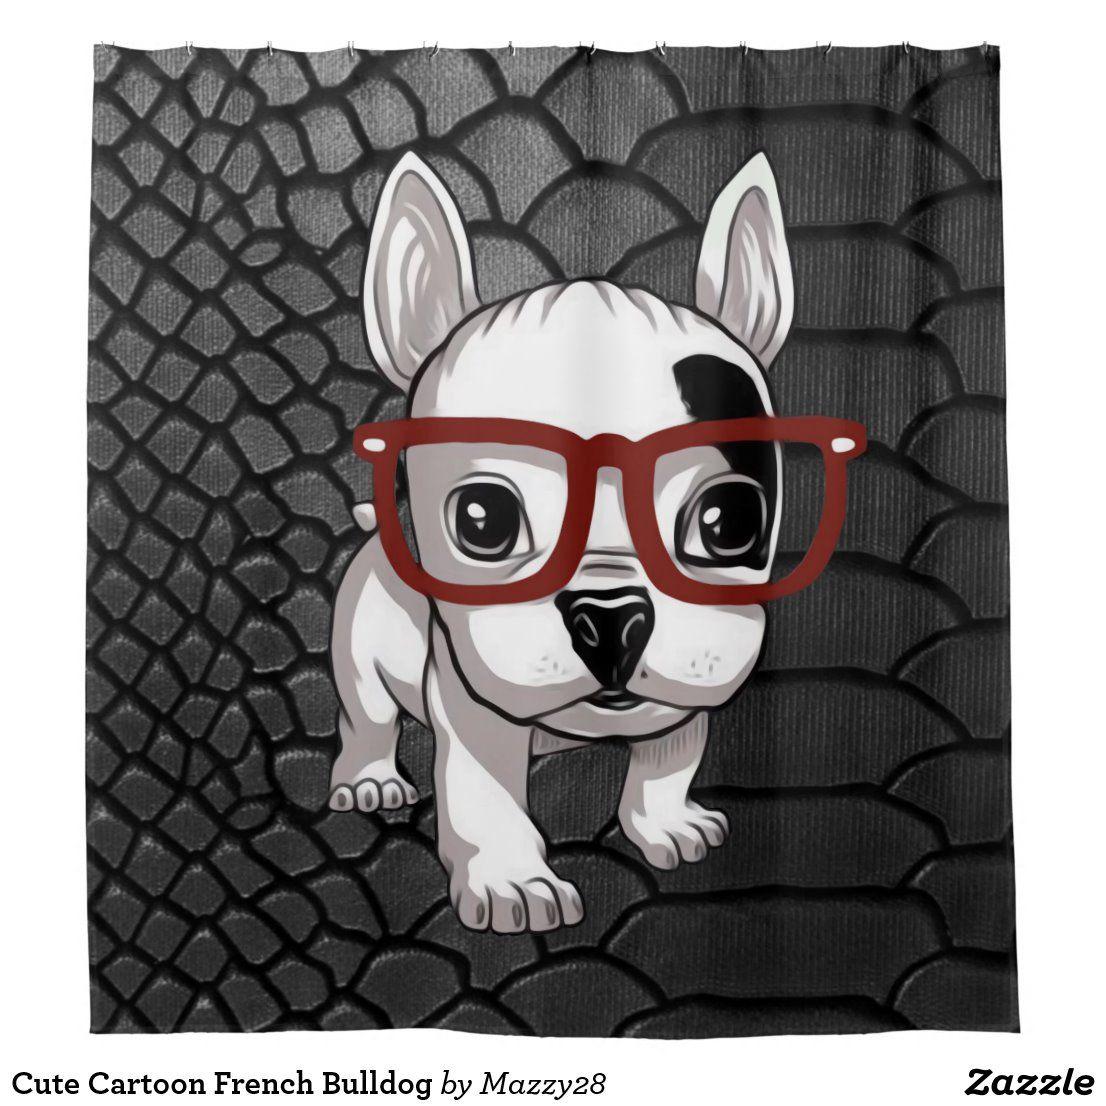 Cute Cartoon French Bulldog Shower Curtain Zazzle Com White